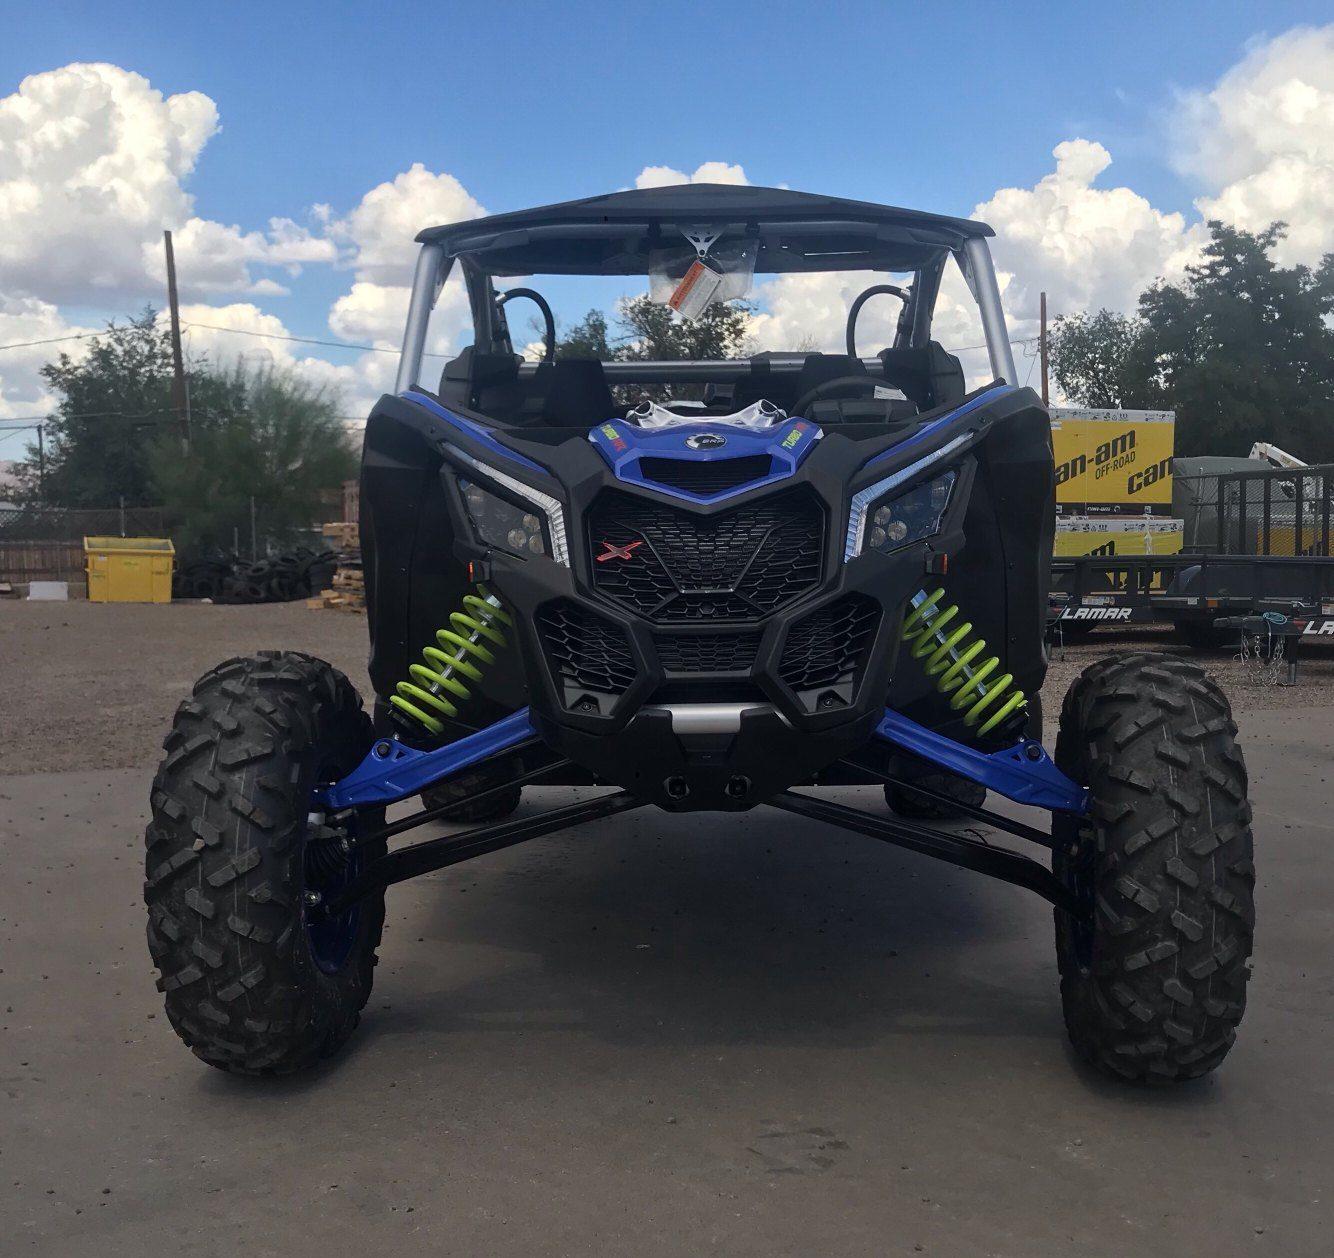 New 2020 Can-Am Maverick X3 X RS Turbo RR Utility Vehicles